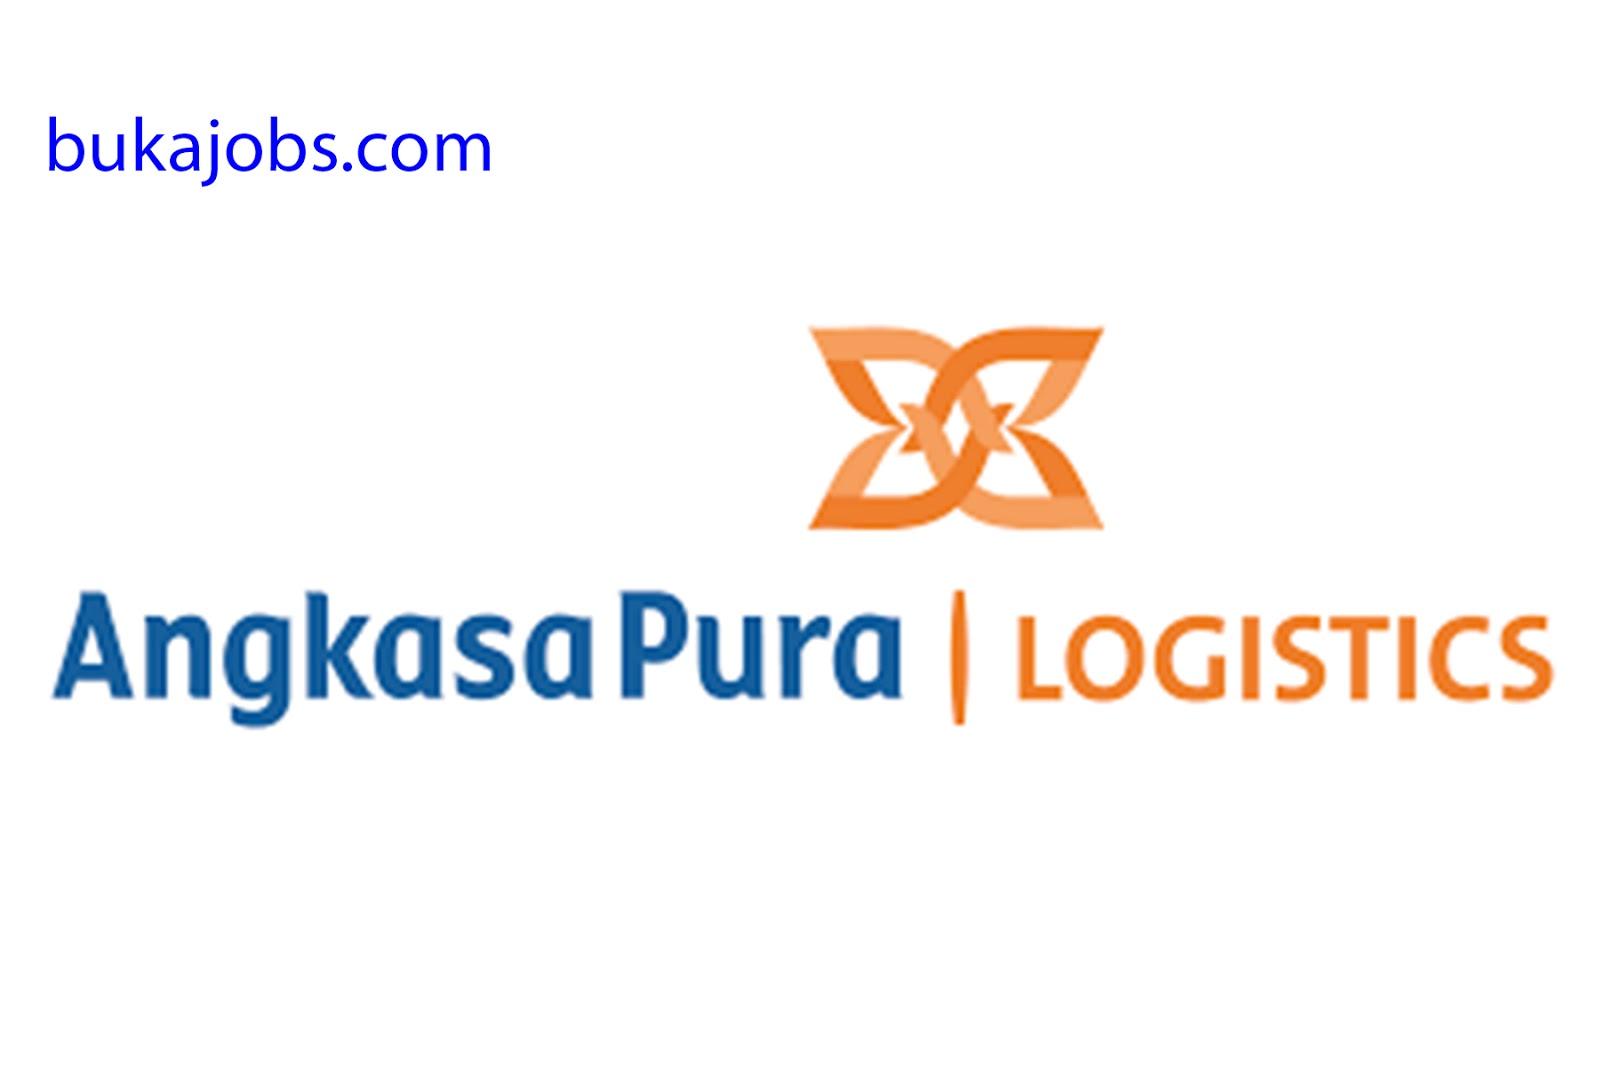 Lowongan Kerja Pt Angkasa Pura Logistik Terbaru 2020 Bukajobs Com